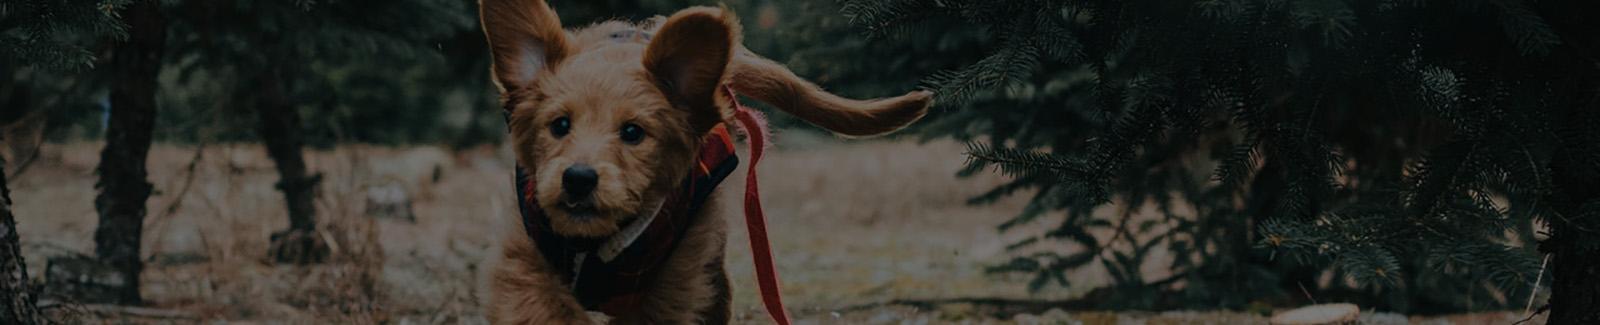 dog running with training collar on